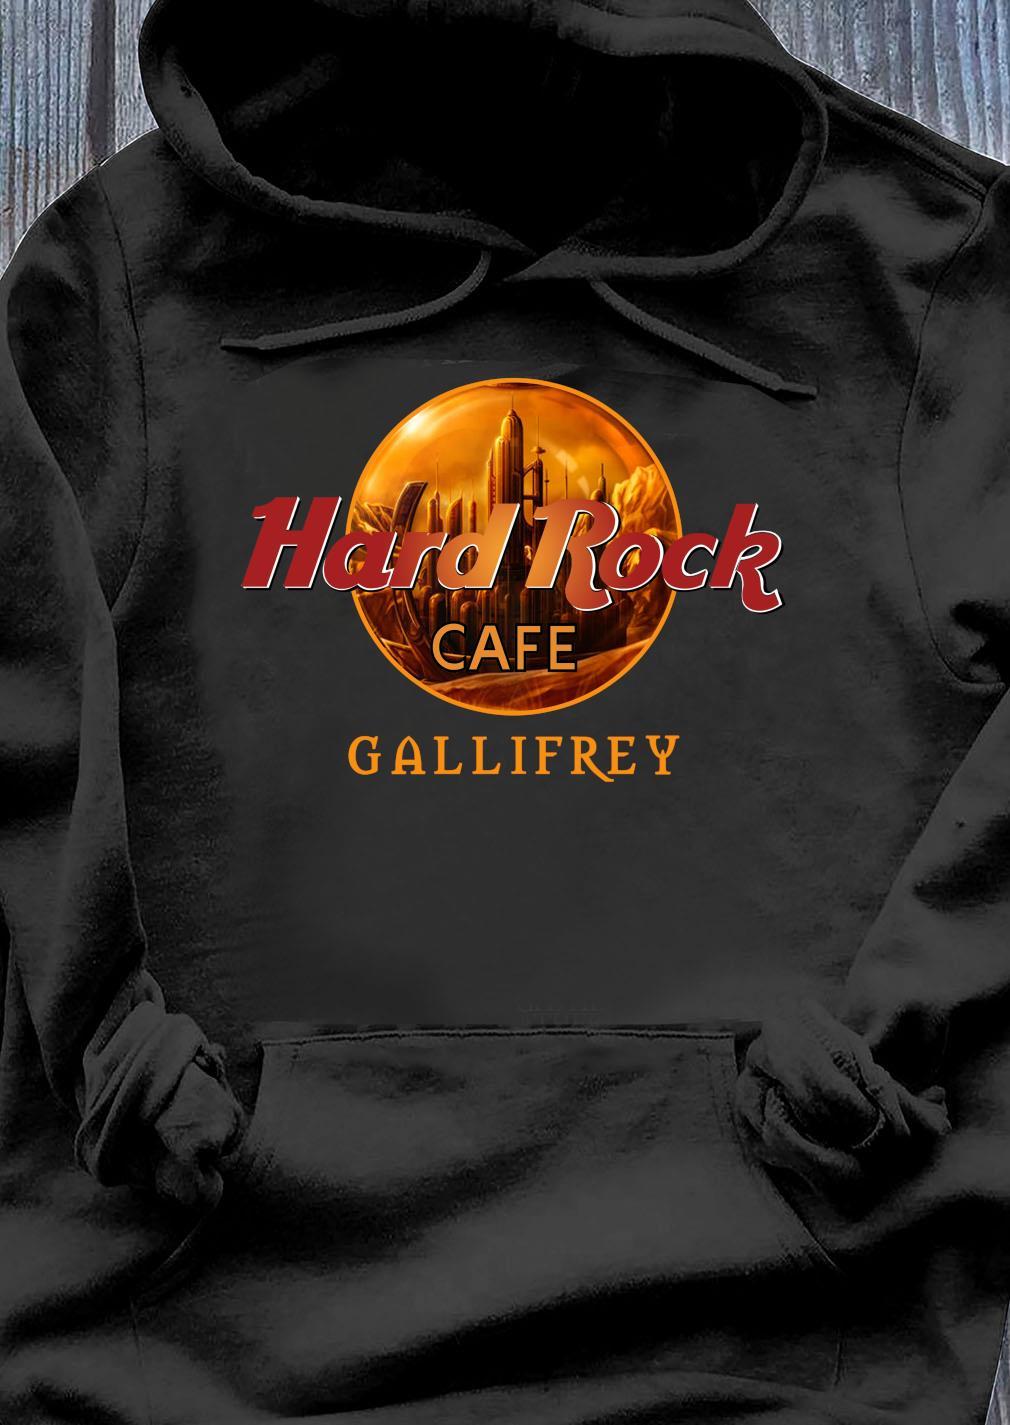 Hard rock cafe Gallifrey s Hoodie